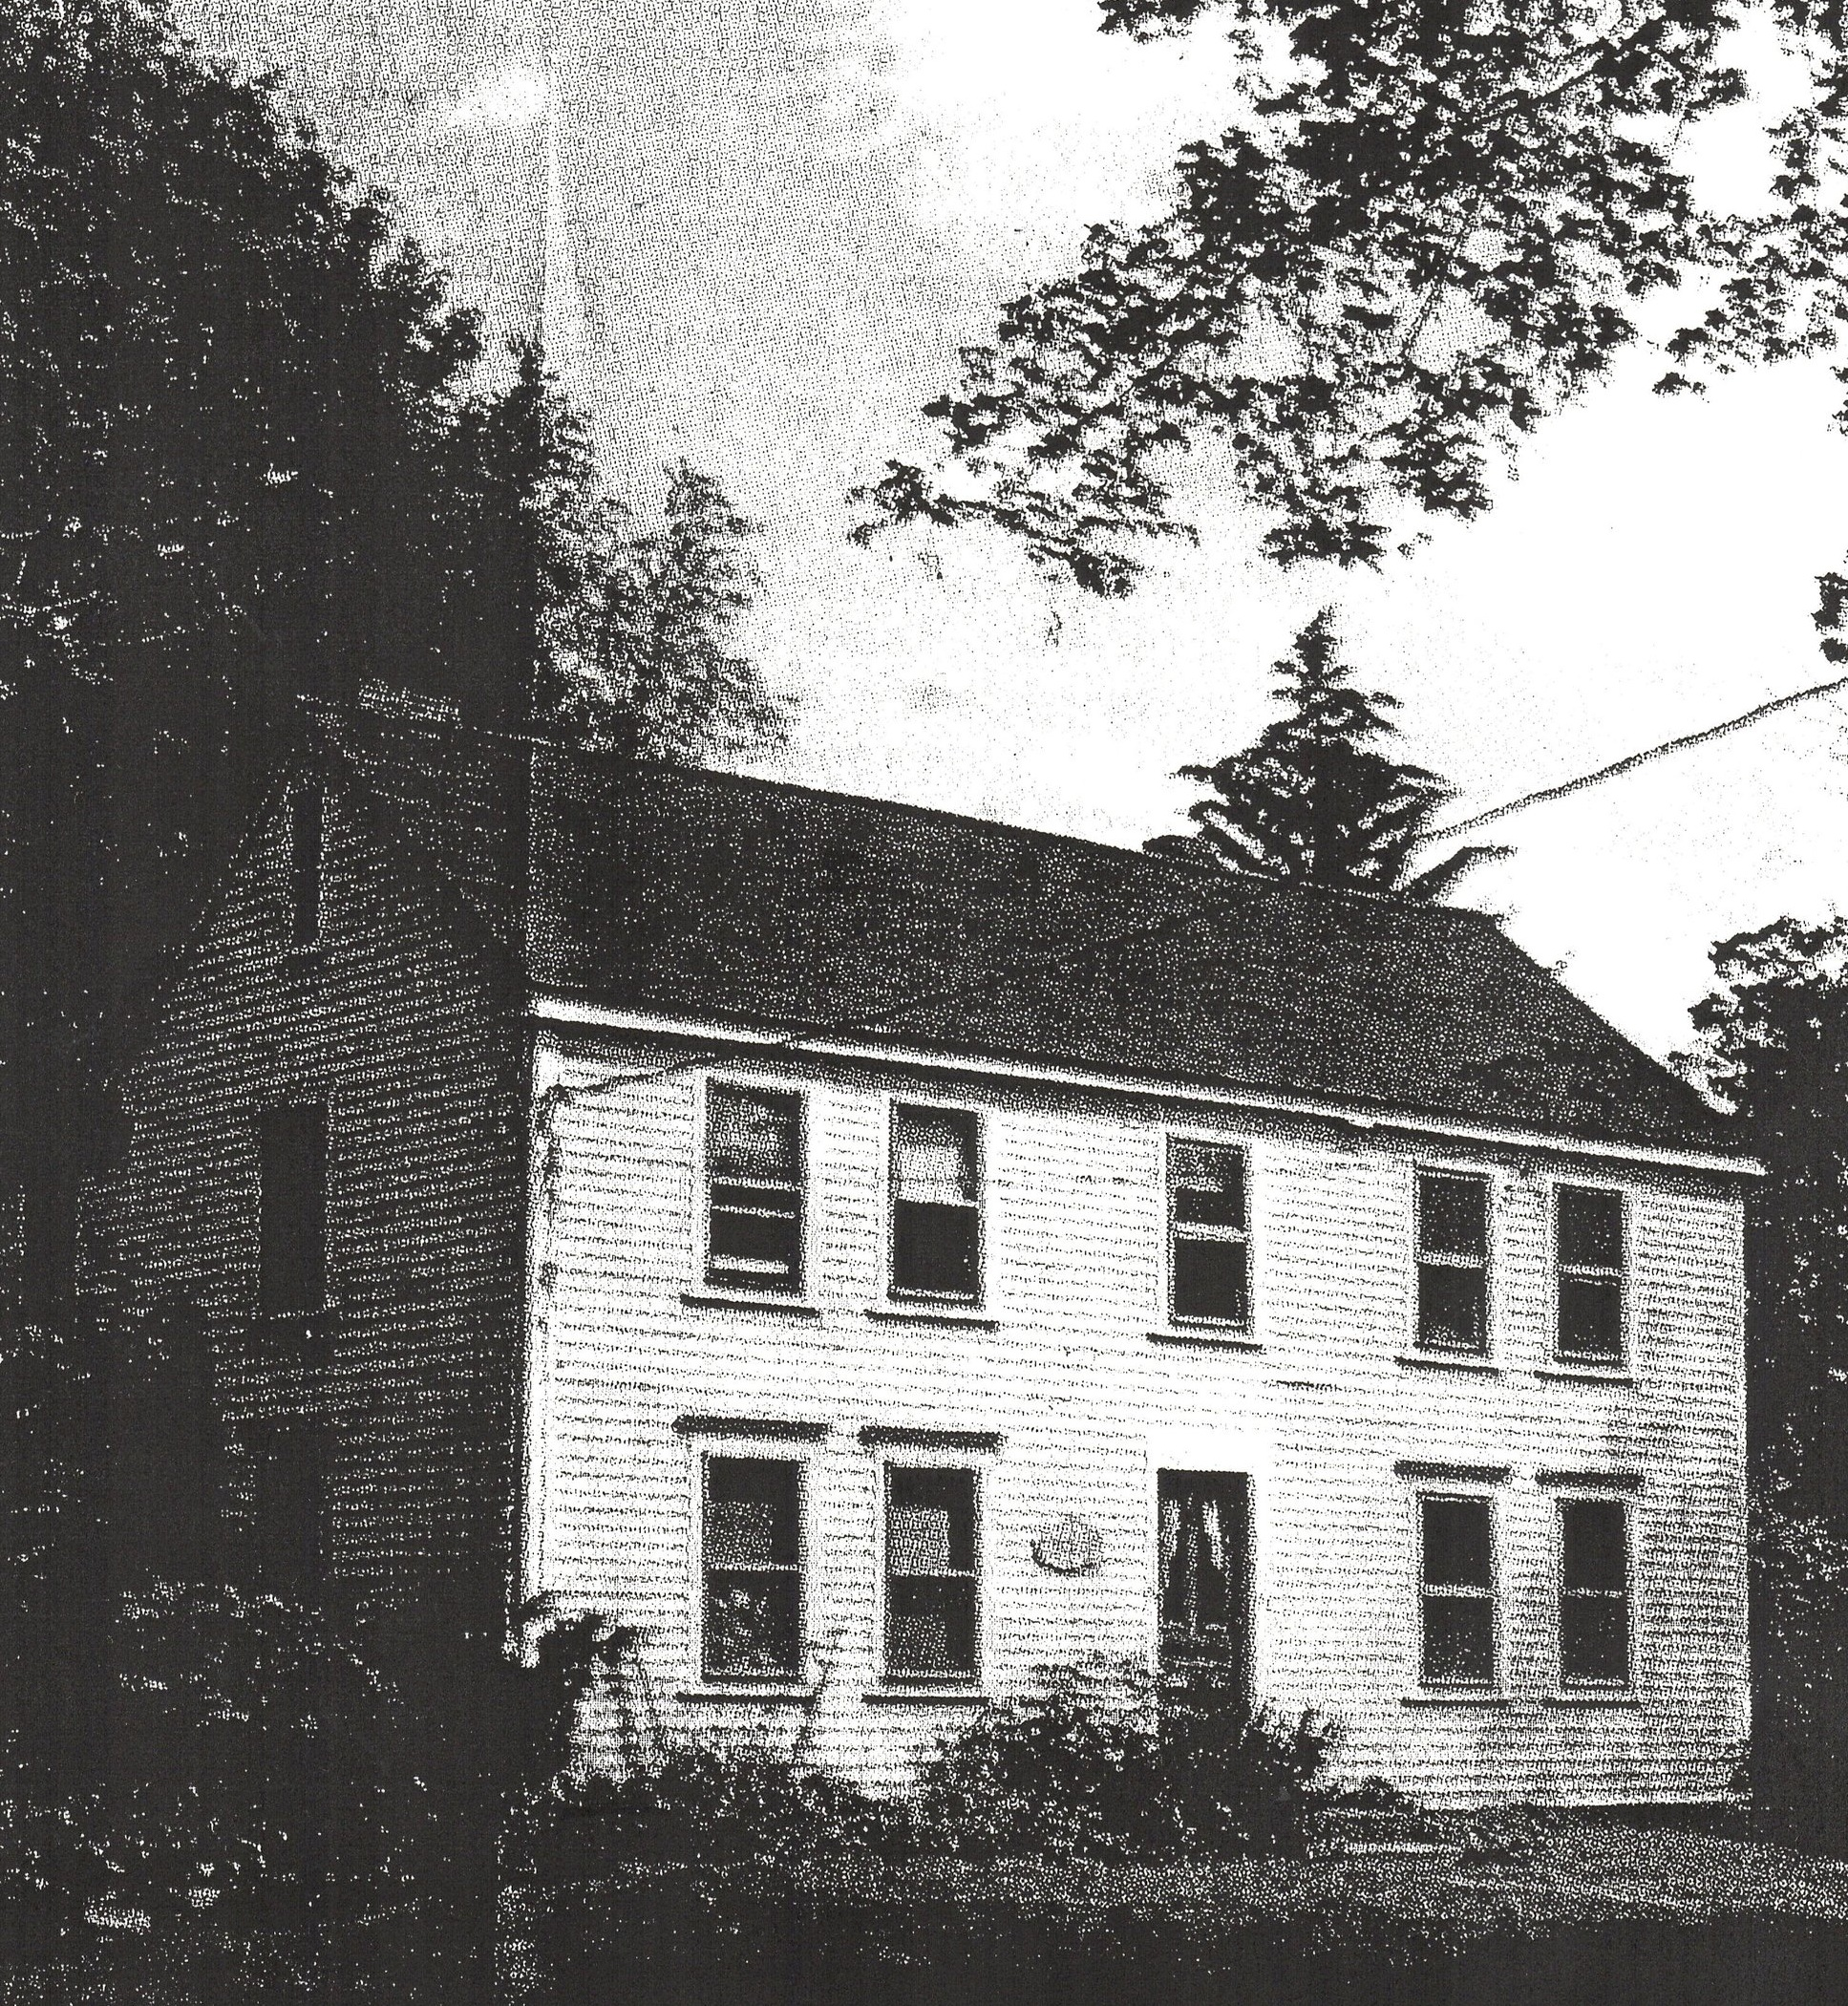 The 1748 Peletiah Morse tavern on Eliot Street in South Natick